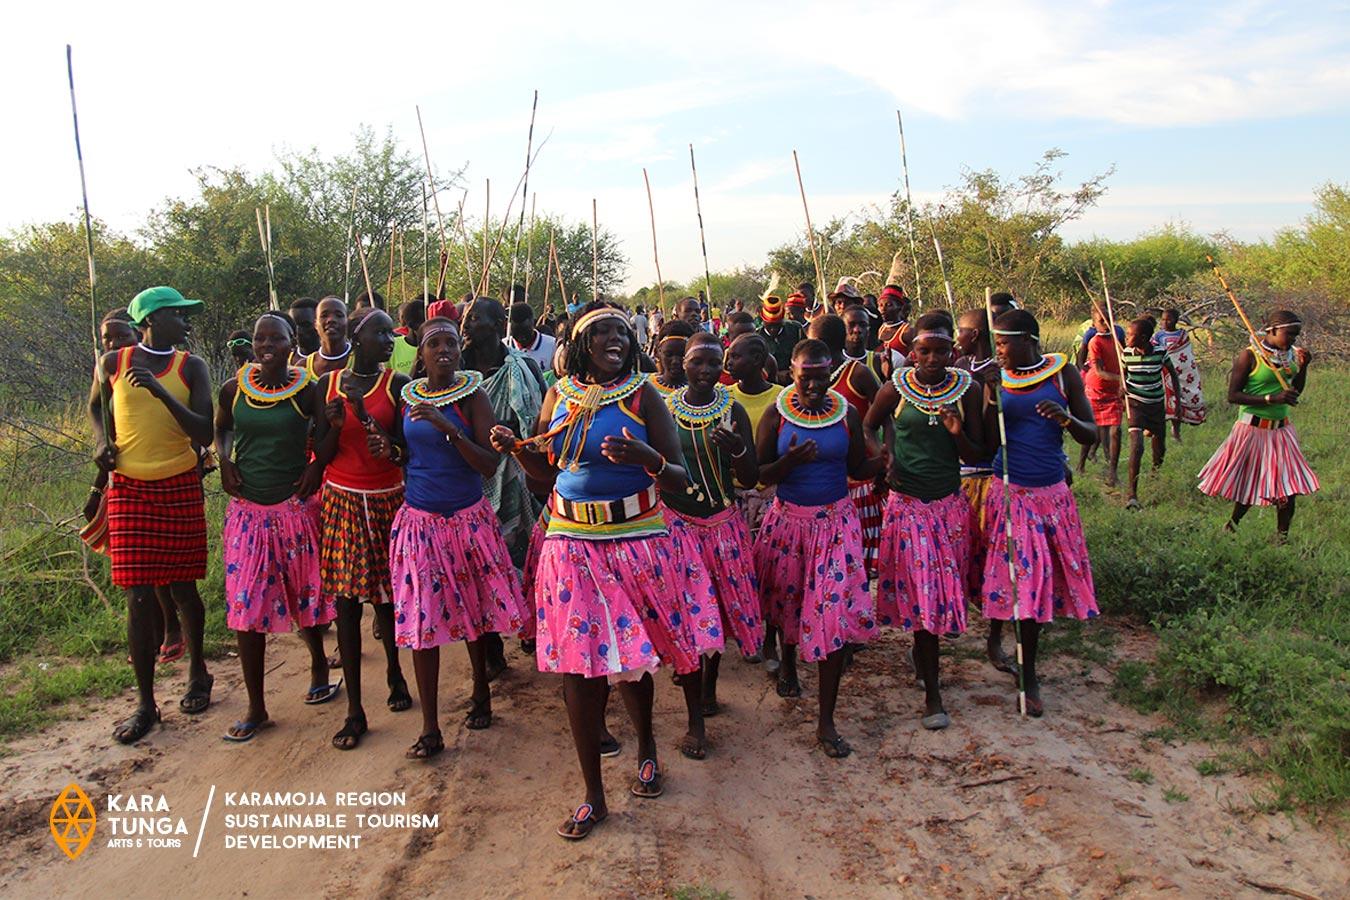 kara-tunga-karamoja-uganda-tours-kalia-peace-village-amudat-pokot-culture-6